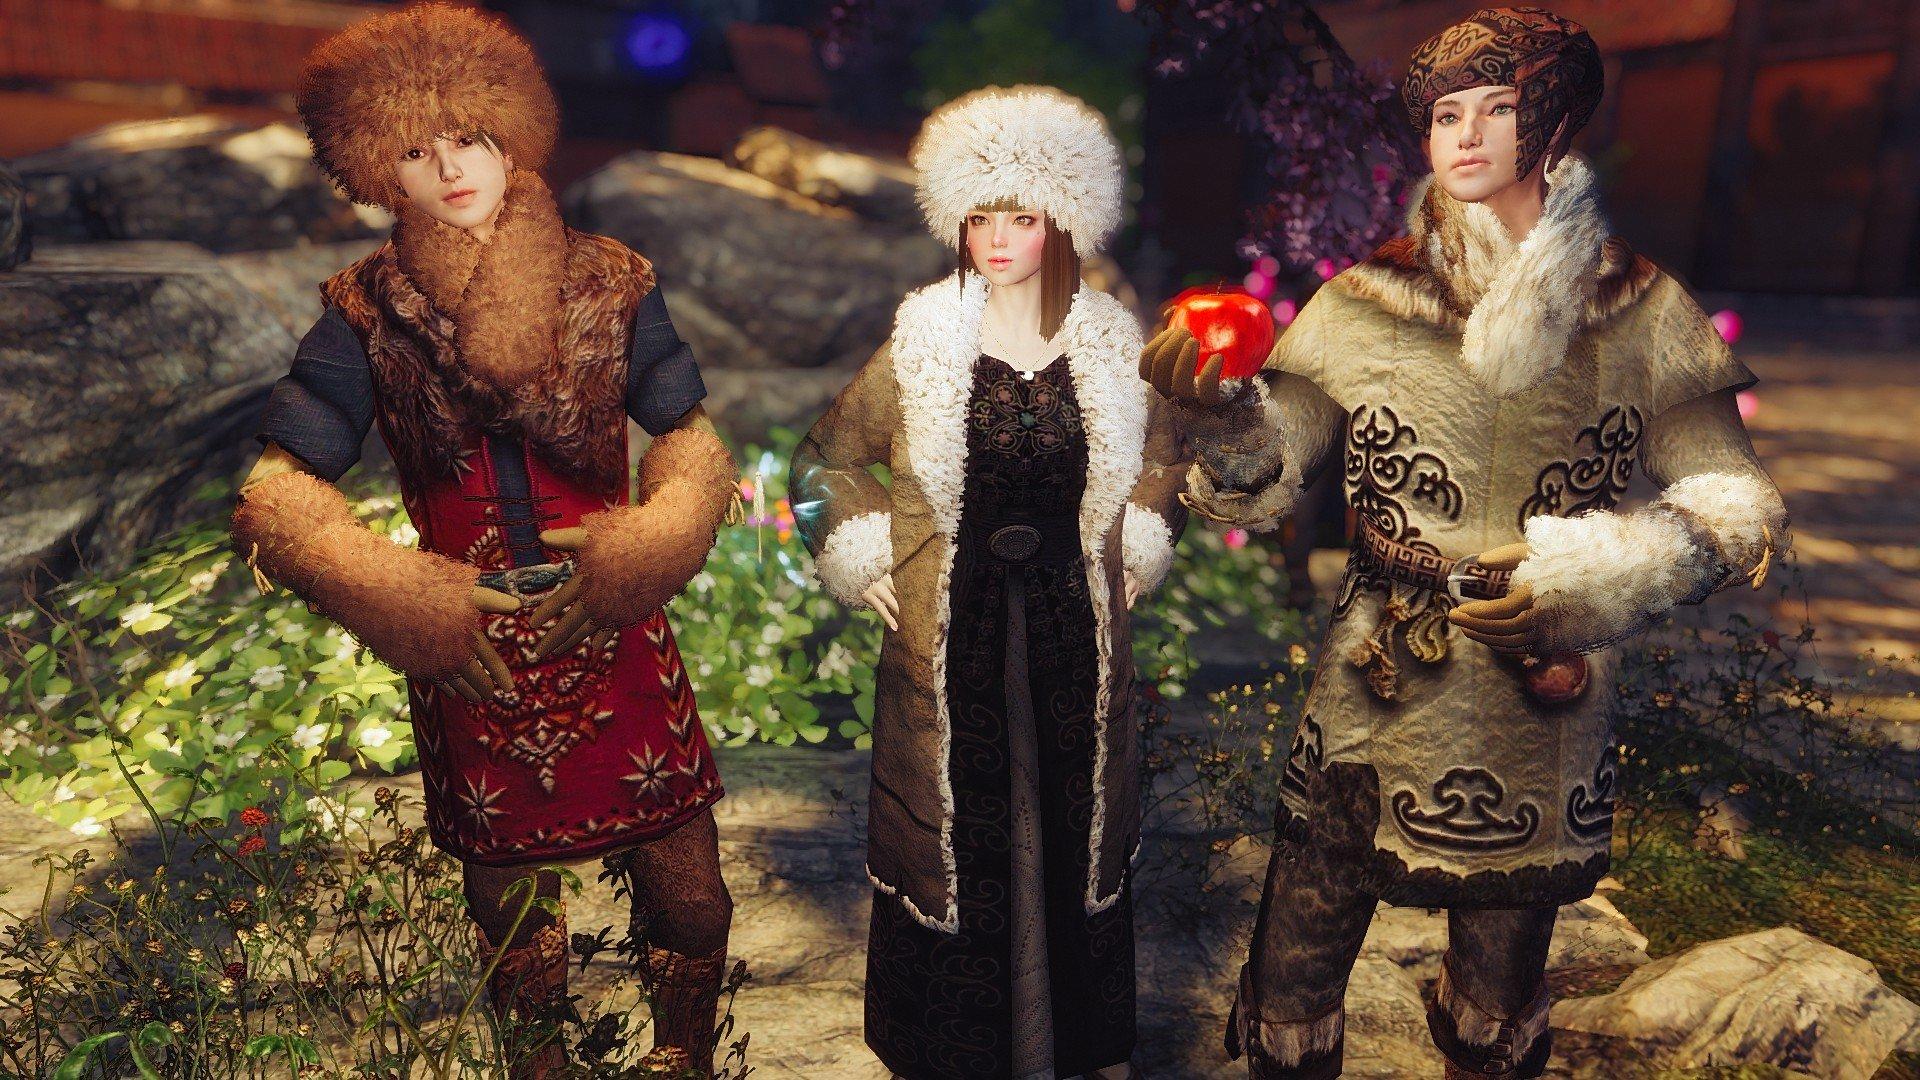 Tasheni's Ethnic Winterclothes Rus